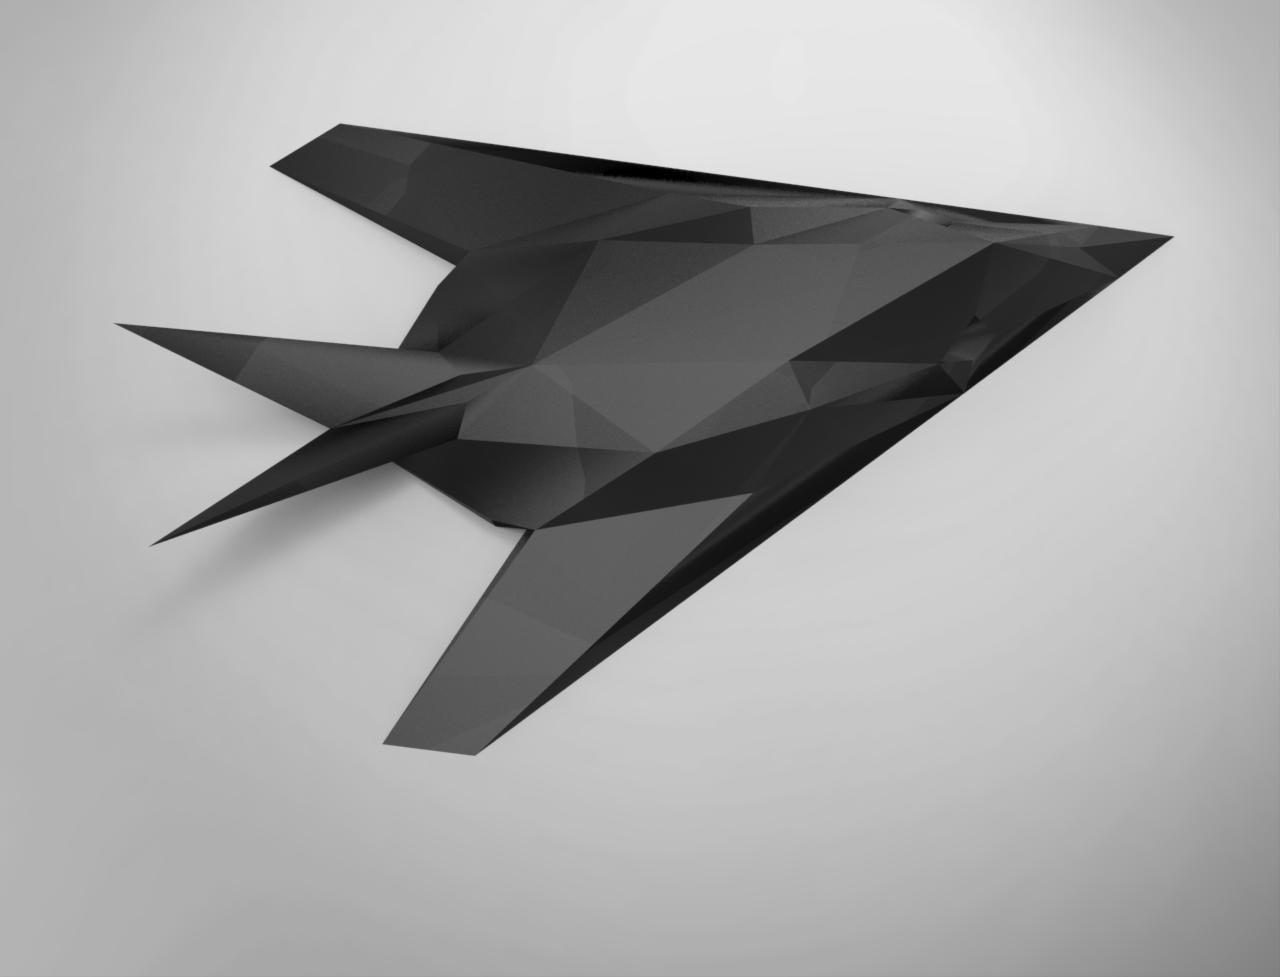 Printable Paper Craft Model Of F 117 Nighthawk Fighter Jet